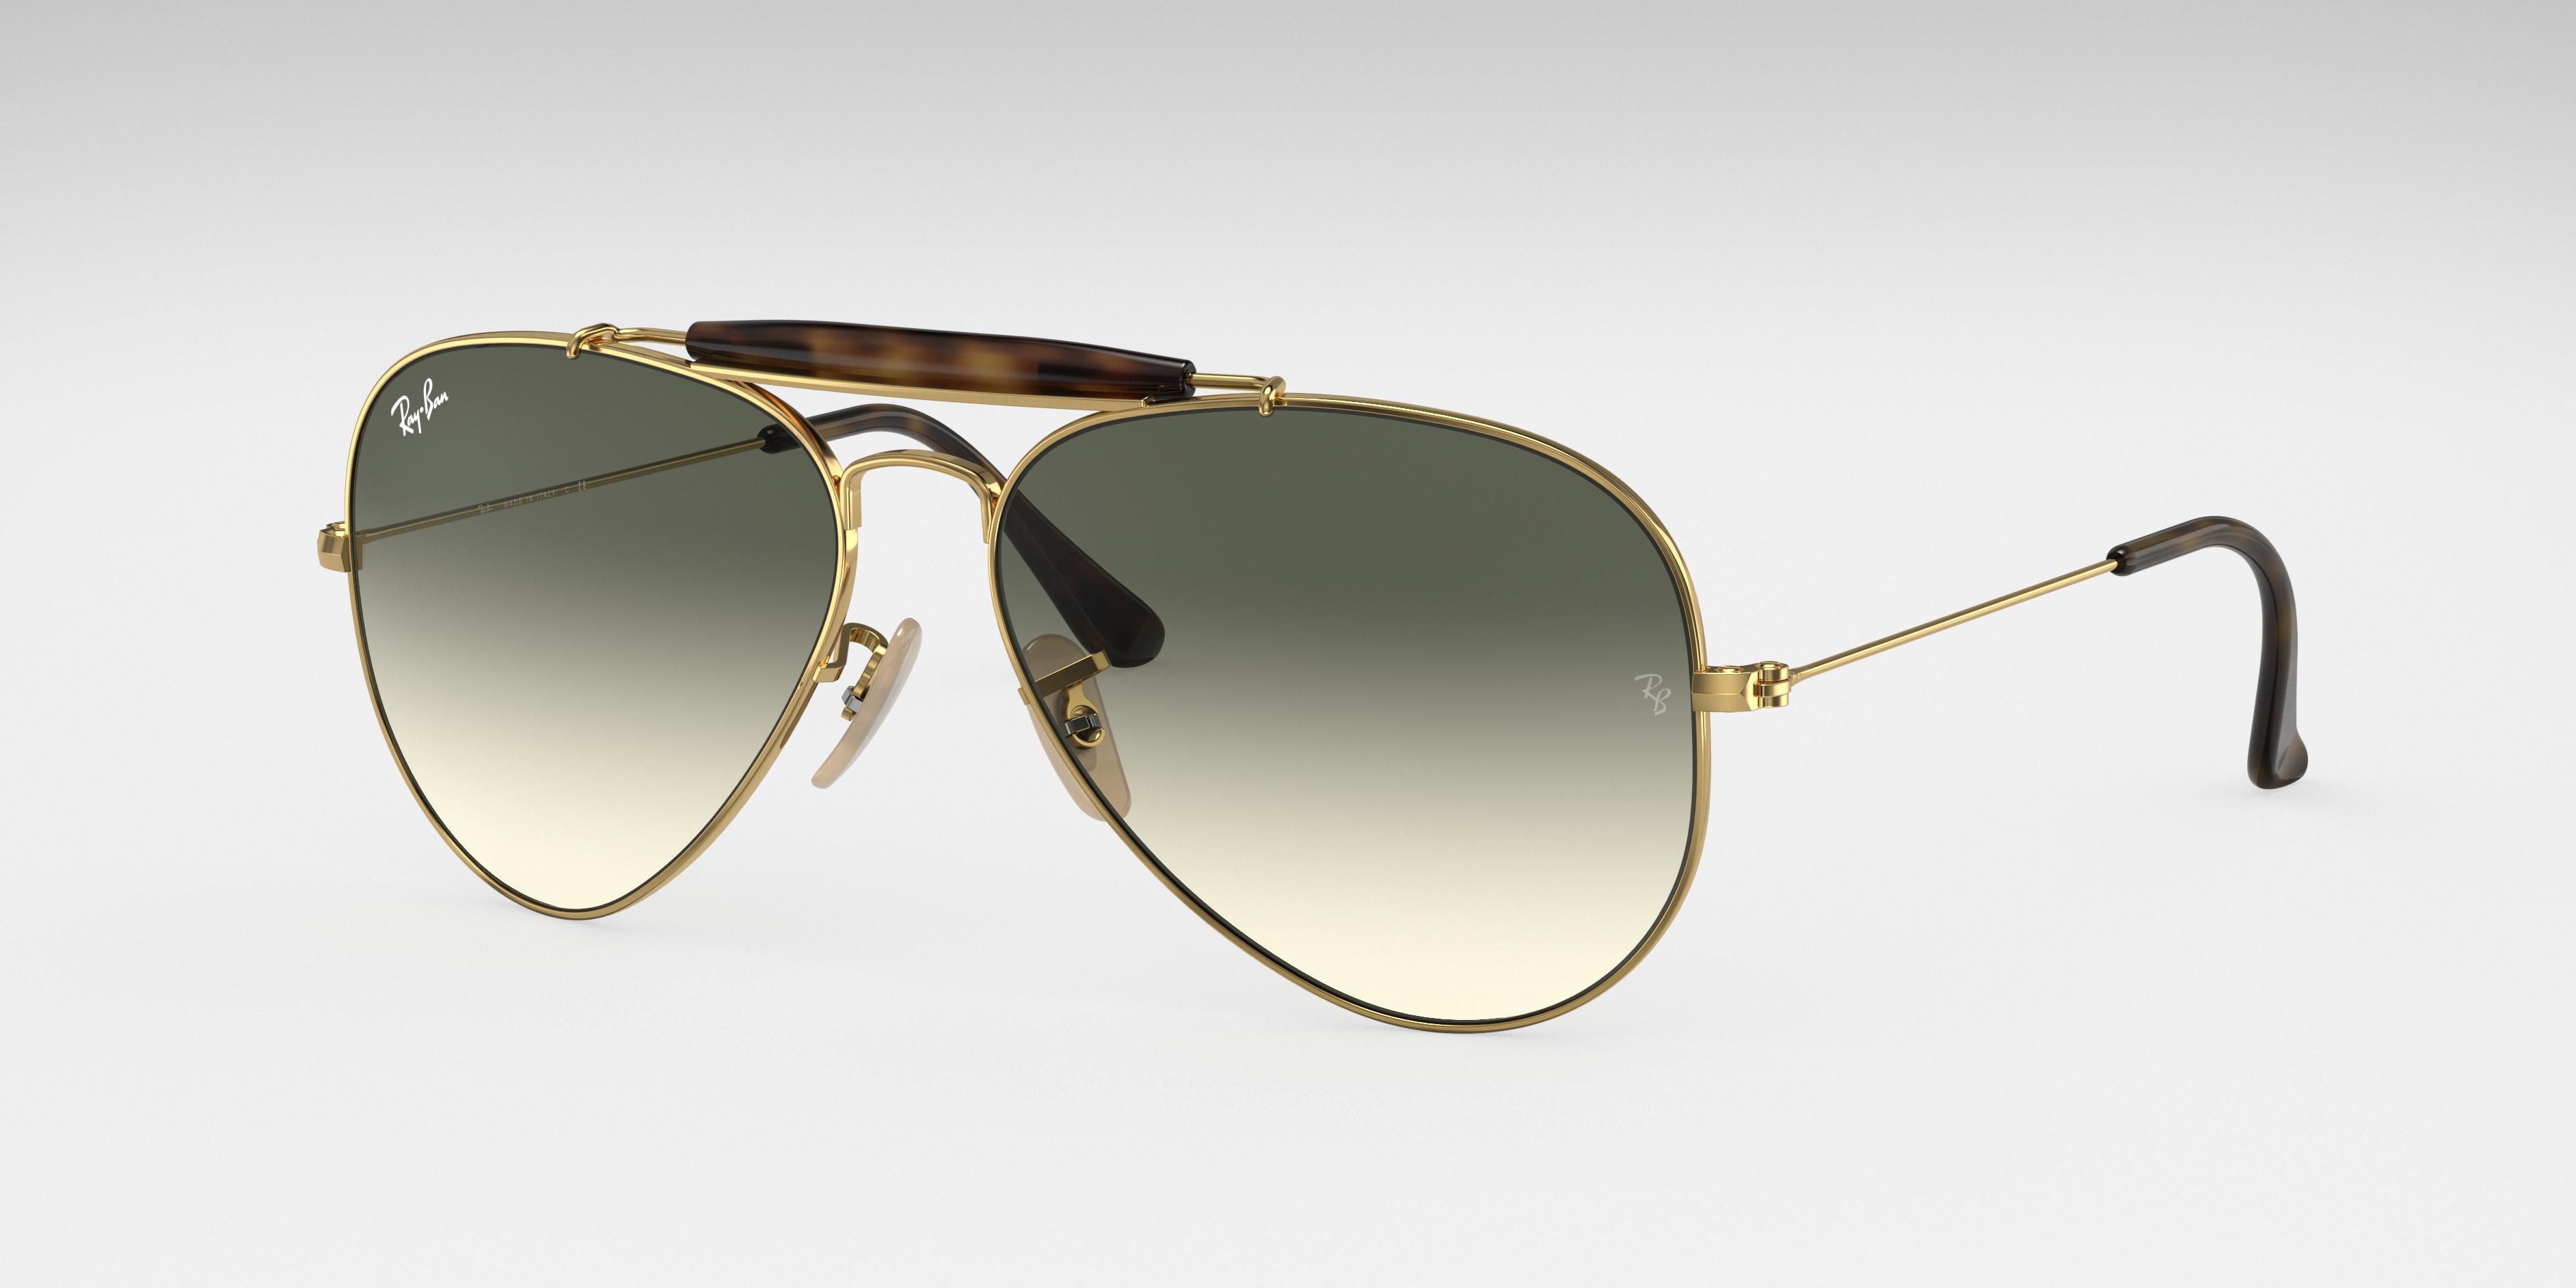 Ray-Ban Outdoorsman Havana Collection Gold, Gray Lenses - RB3029